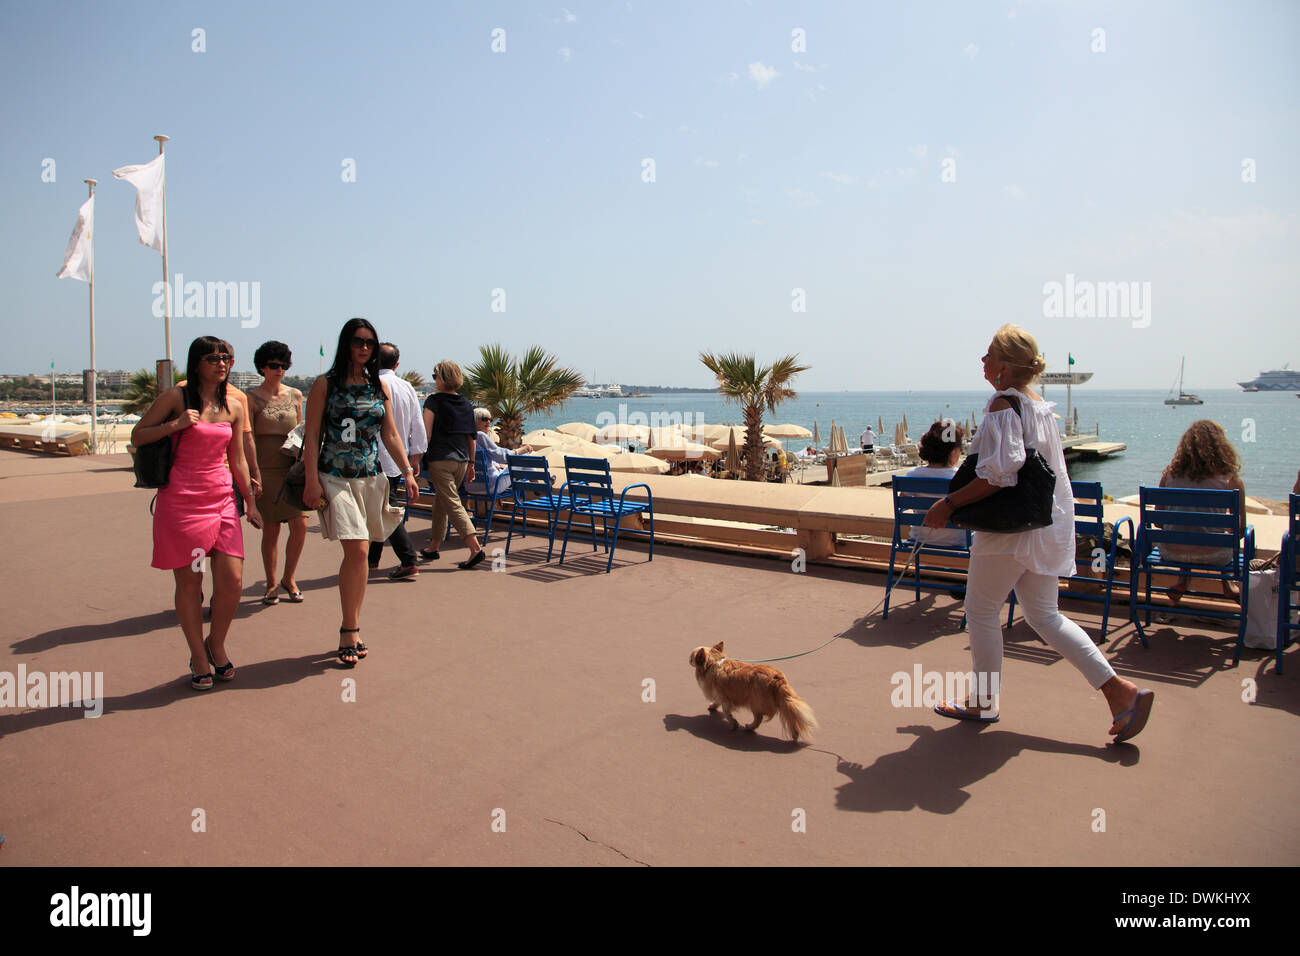 La Croisette, Cannes, Cote d'Azur, Alpes Maritimes, Provence, French Riviera, France, Mediterranean, Europe - Stock Image